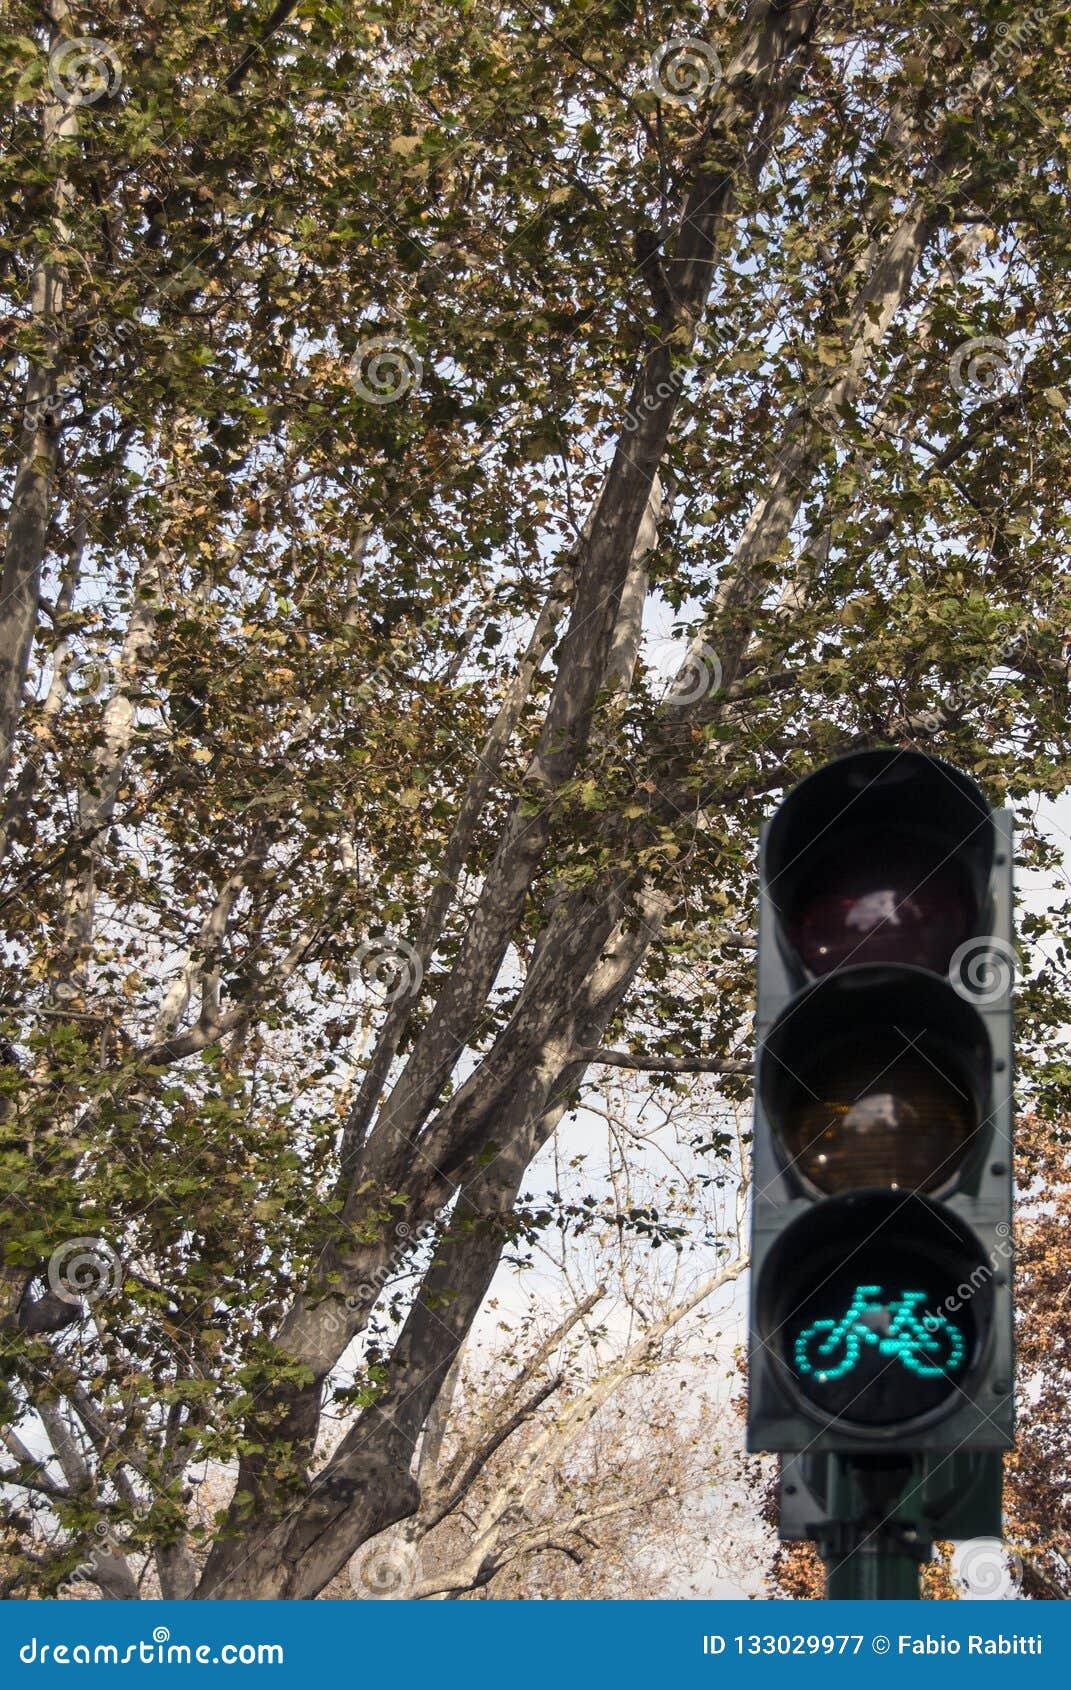 Bike traffic light on tree background.